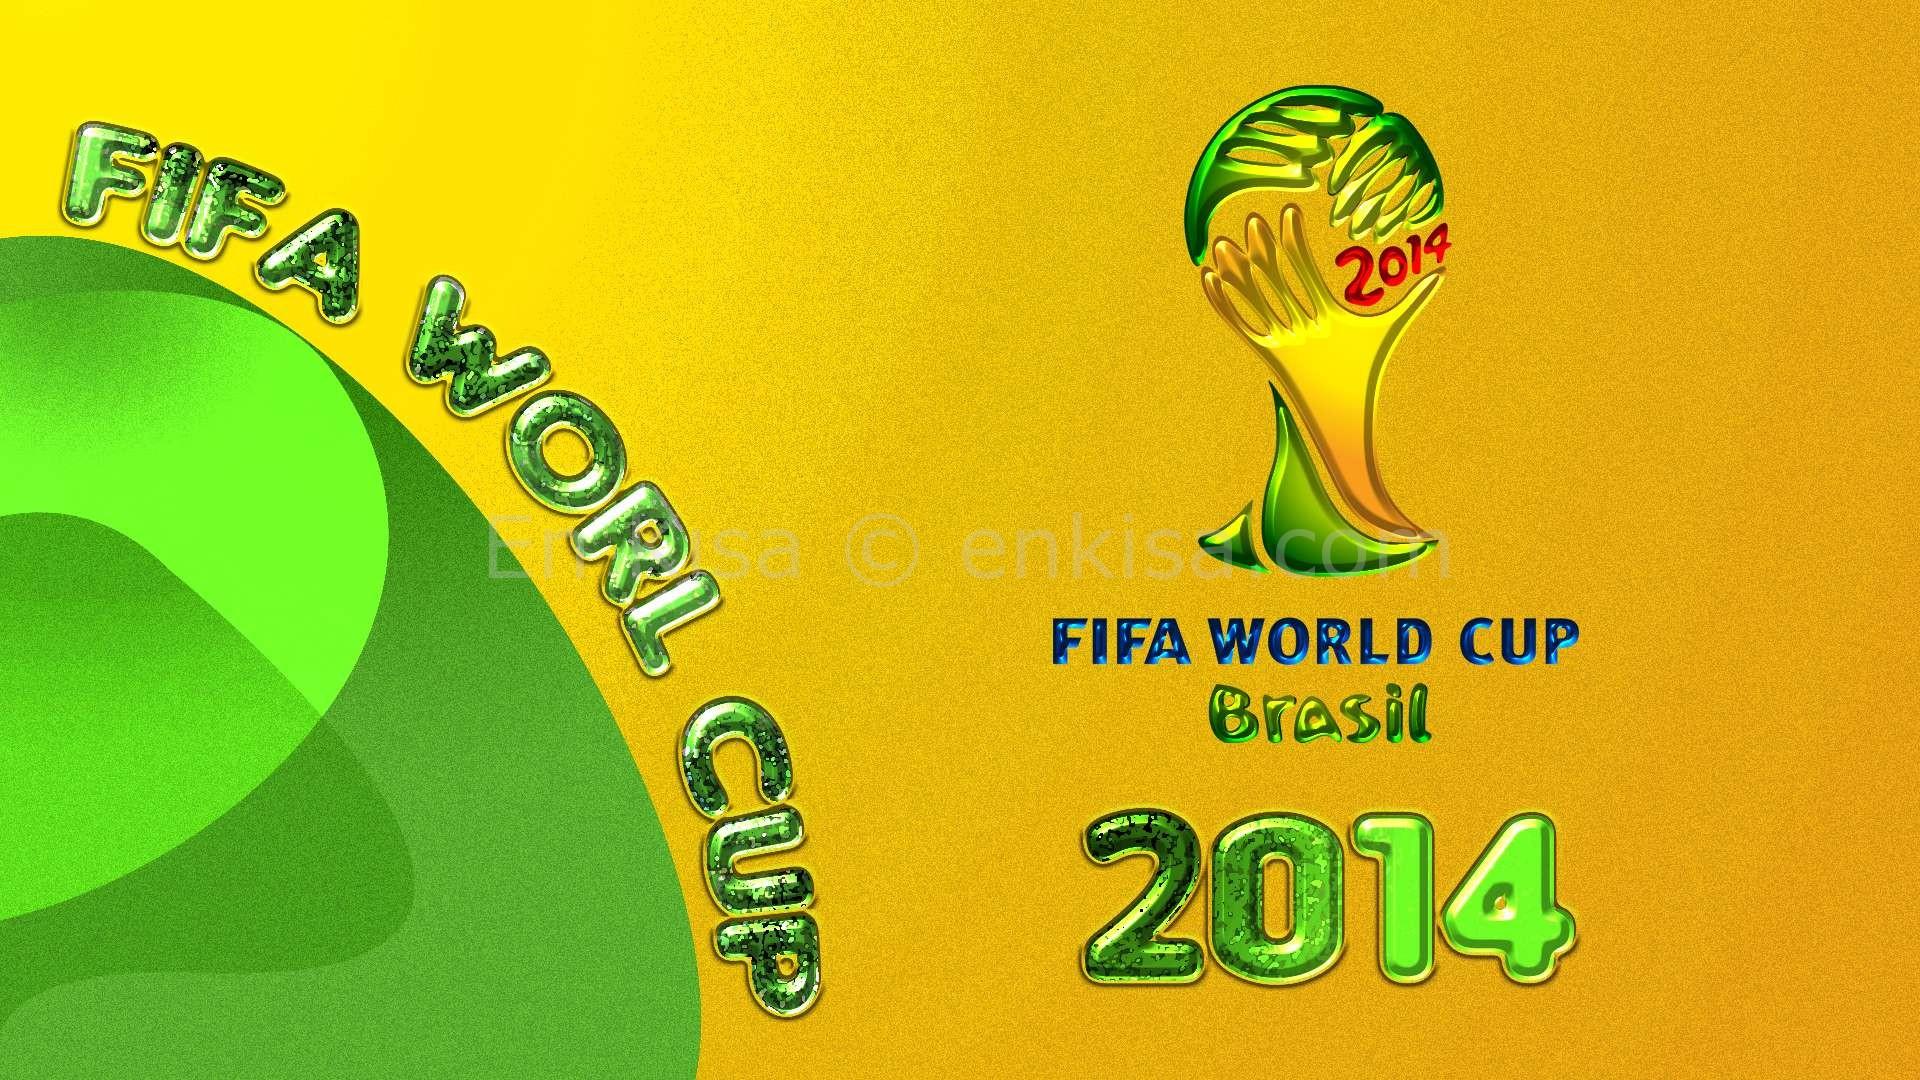 Fifa-WM-2014-Logo-HD-wallpaper-cheap-stock-photo-1920x1080